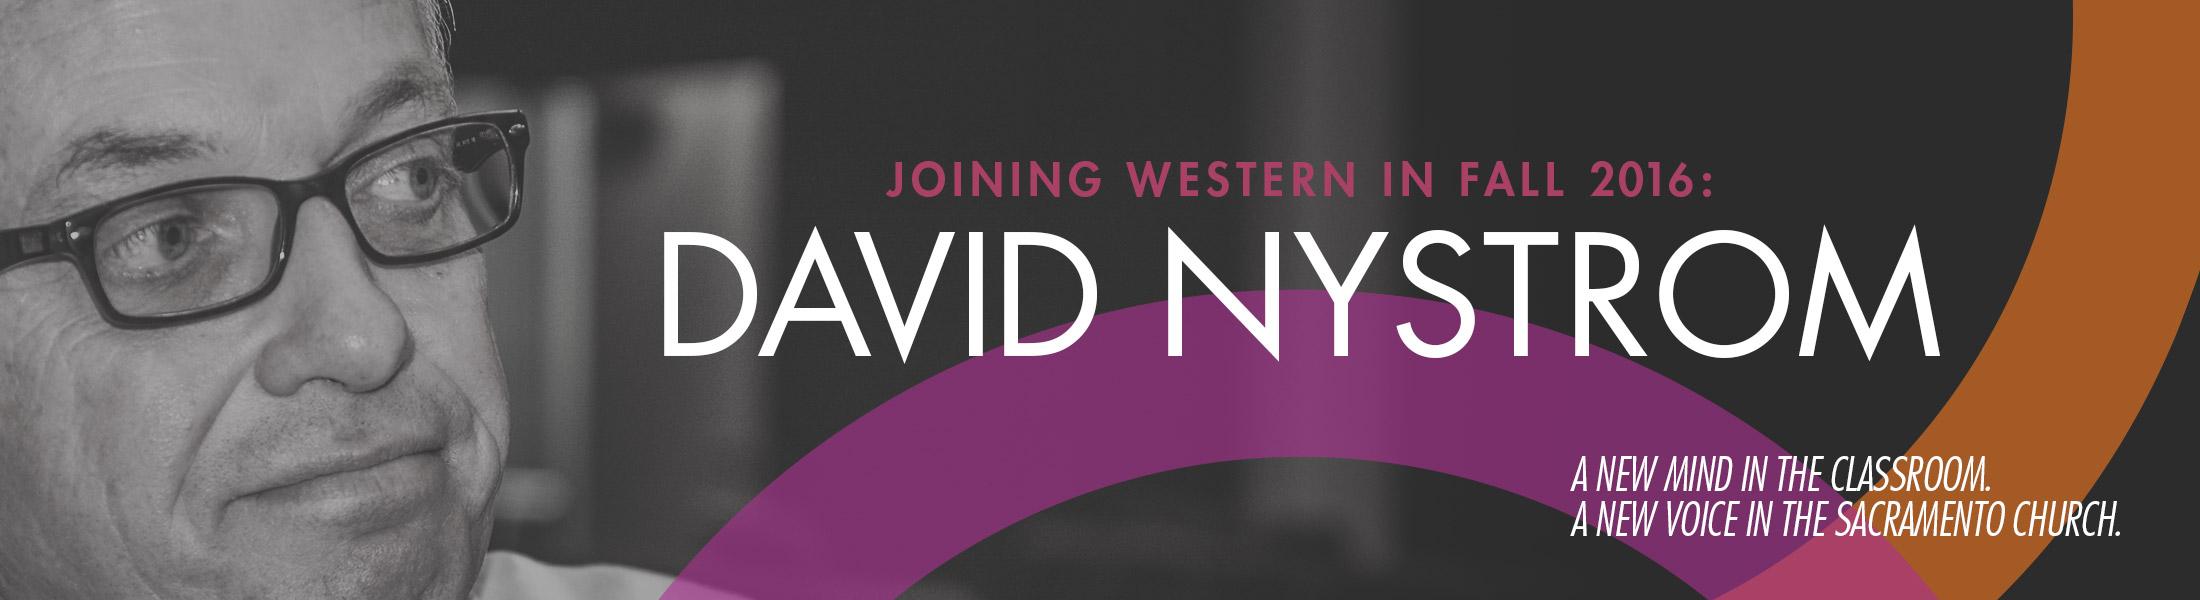 Dr. David Nystrom joins Western Seminary Sacramento Campus